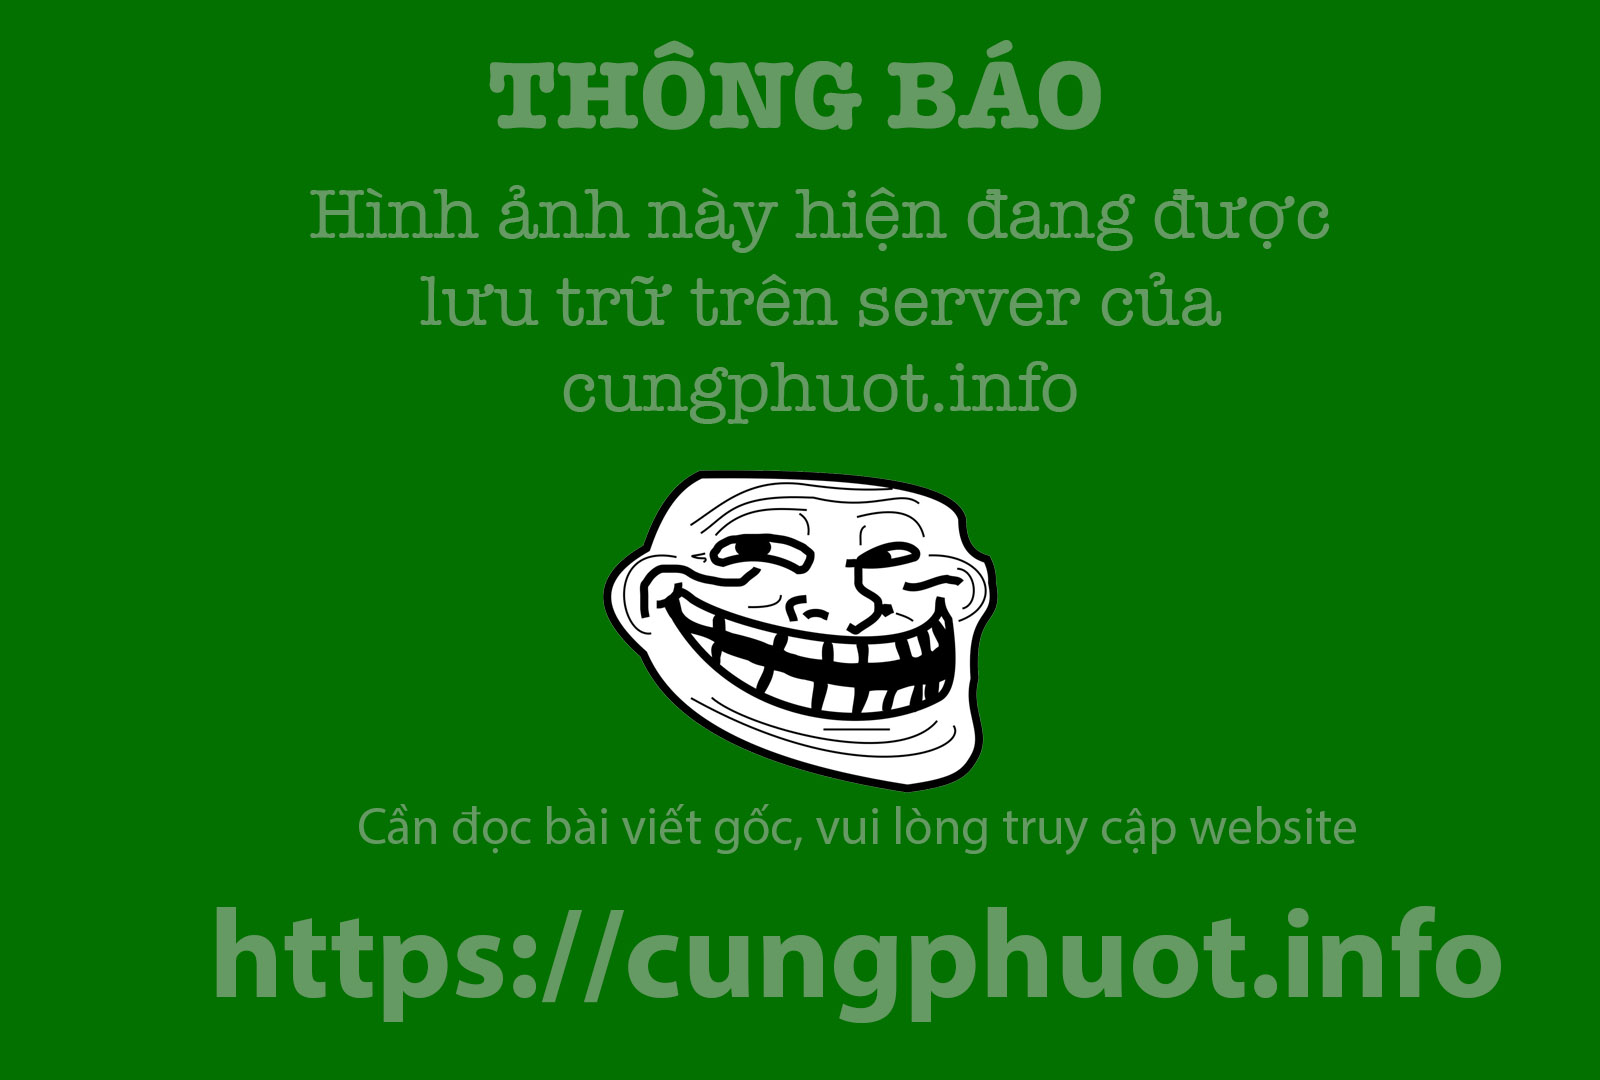 Dan phuot me man ve dep ky vi cua hang Prai o Quang Tri hinh anh 9